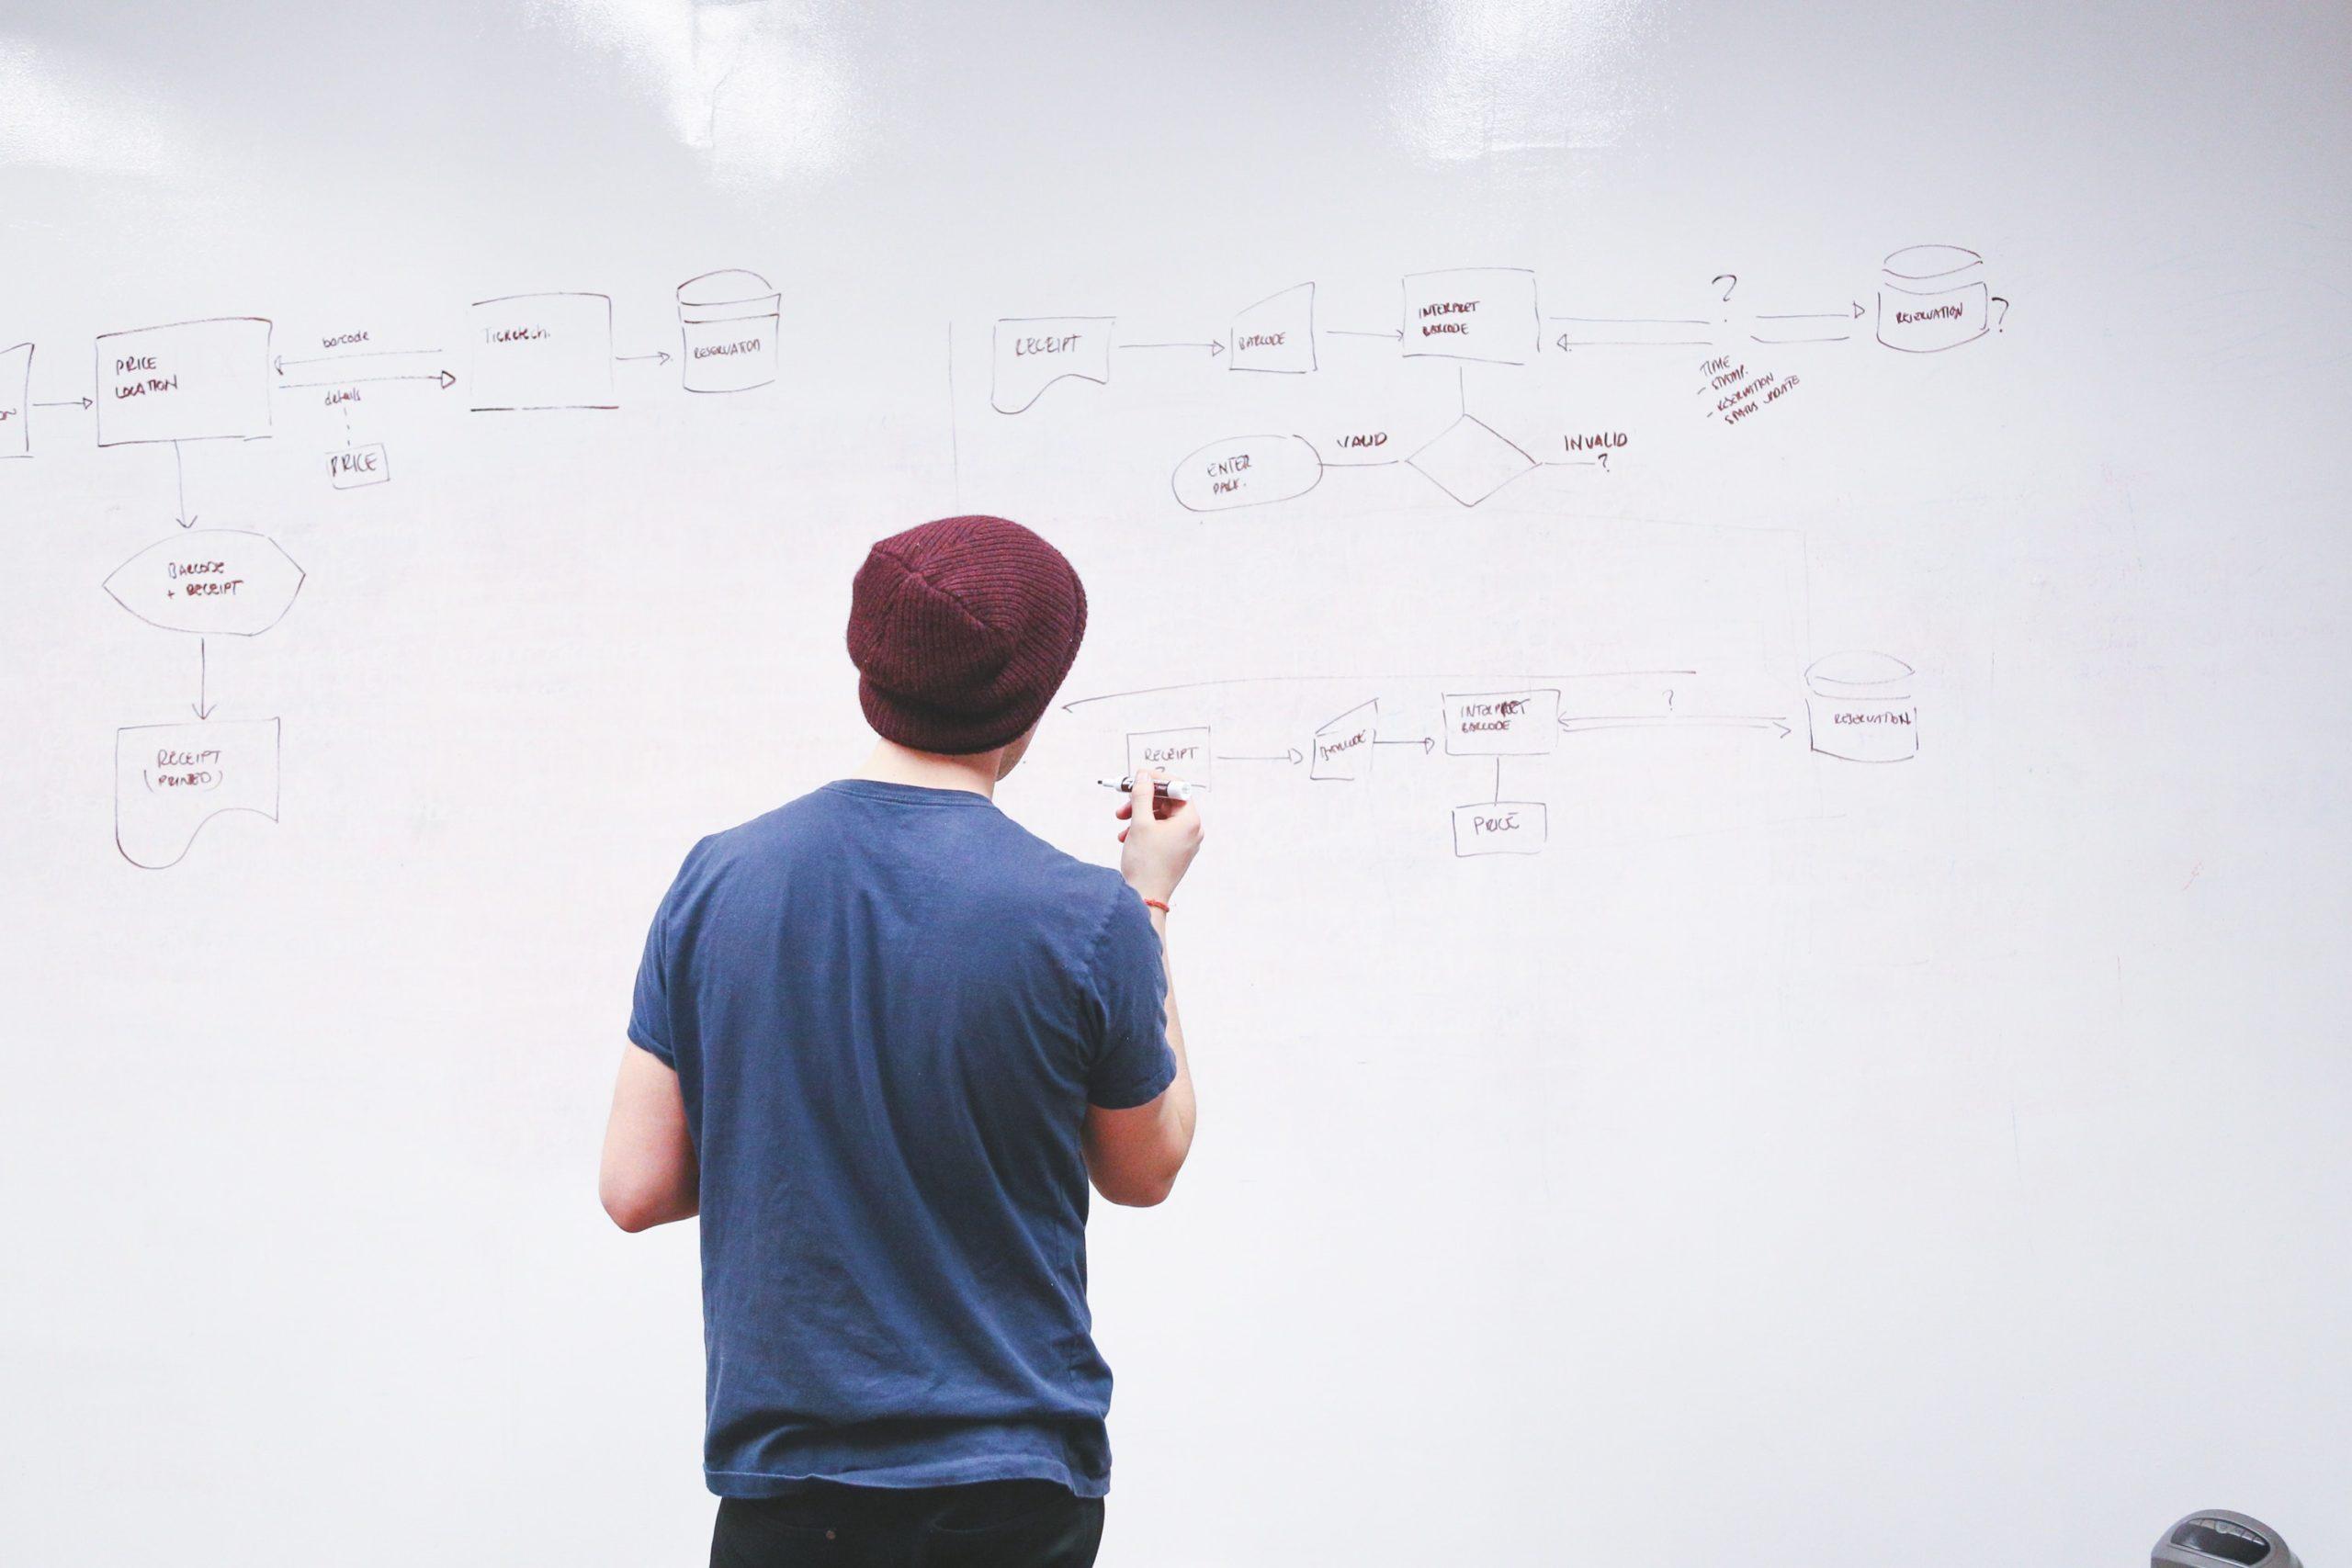 Man standing by whiteboard organizing data